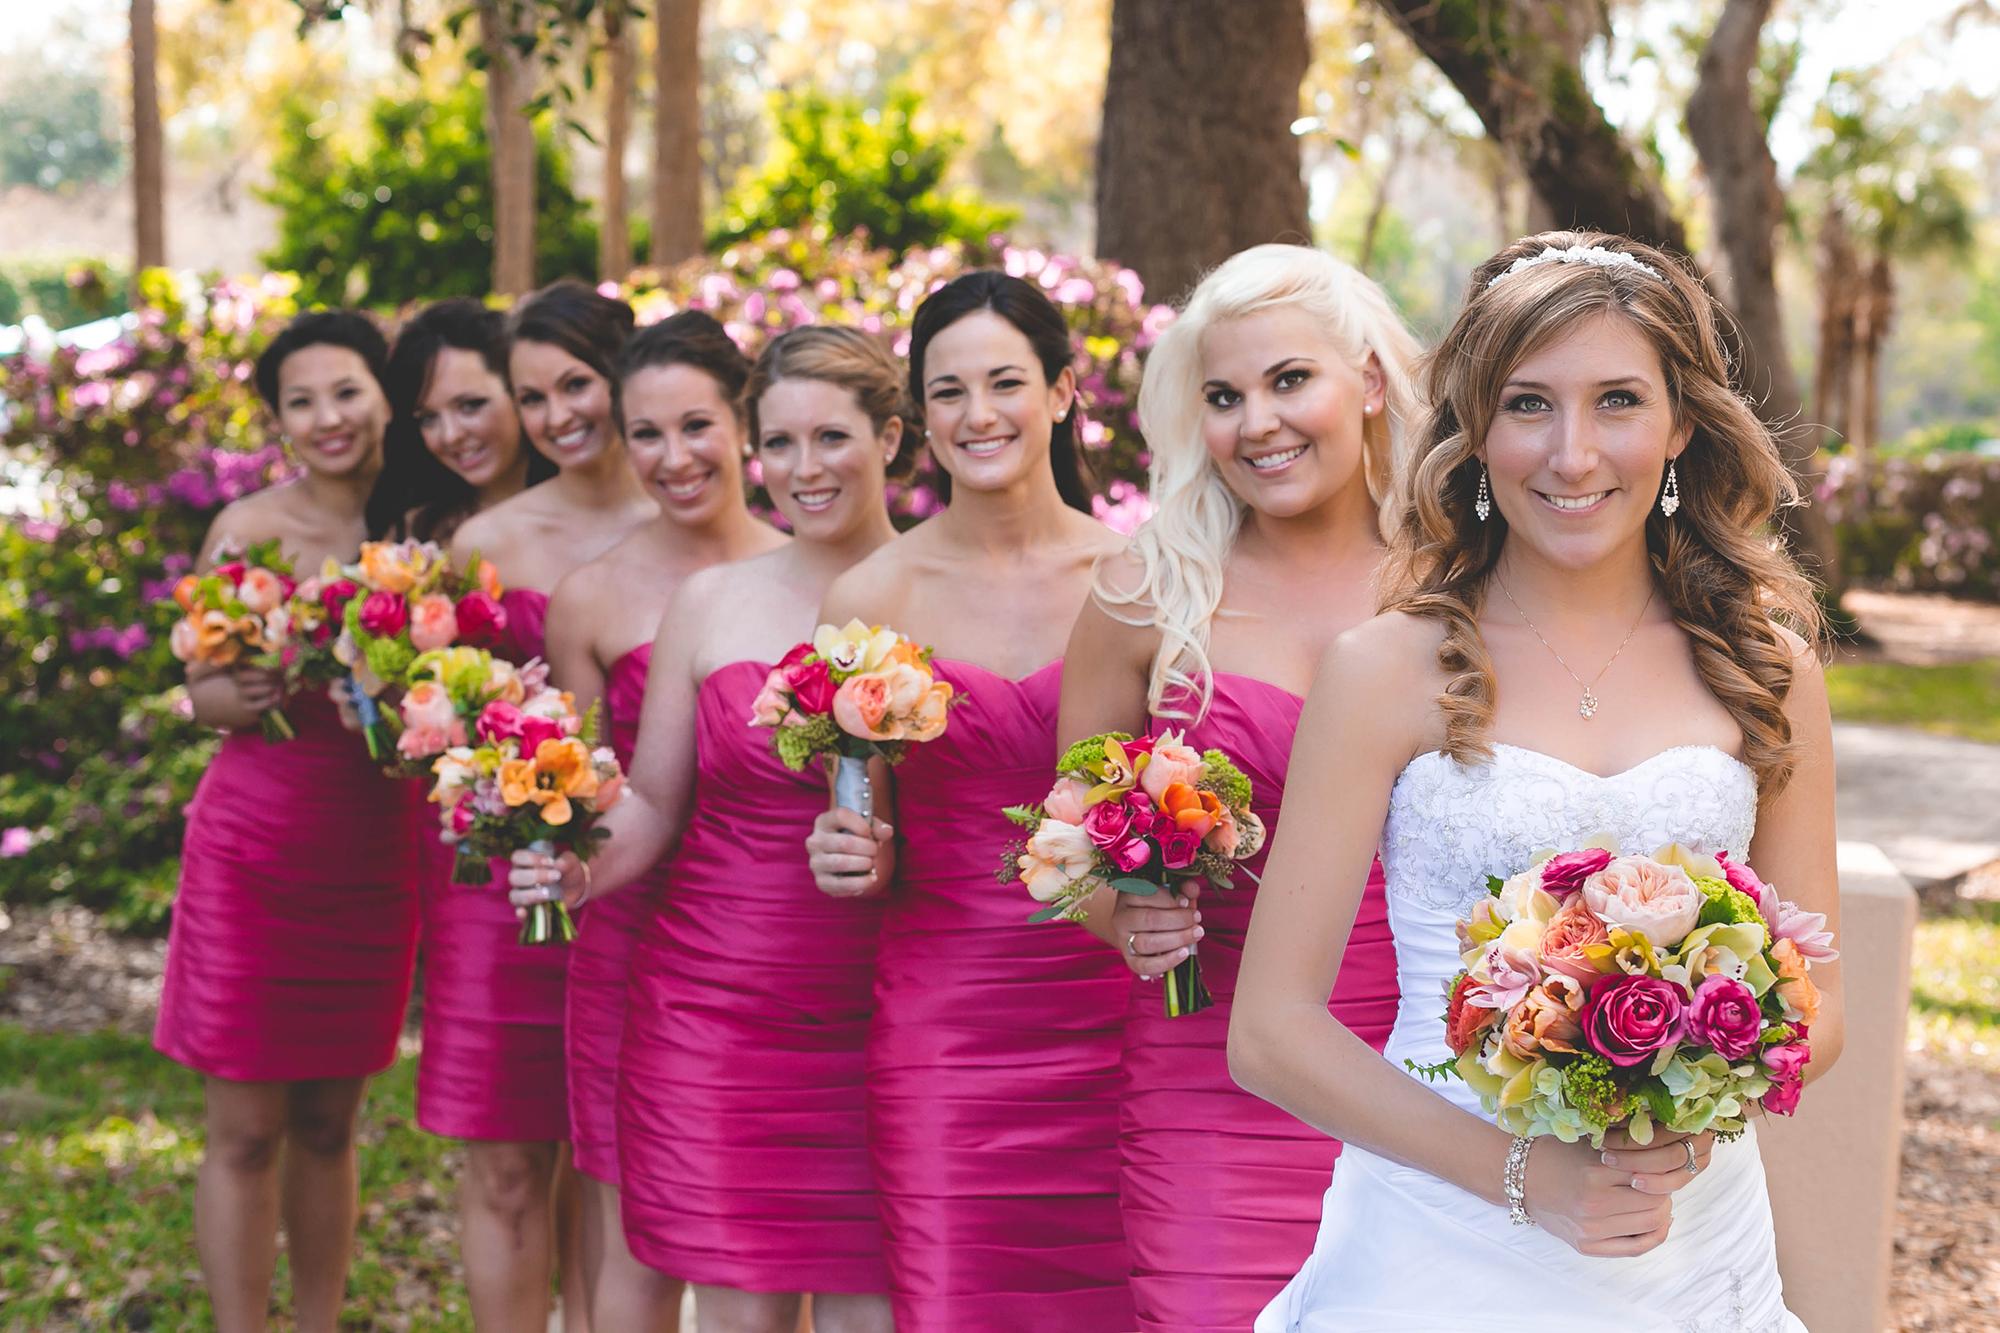 adam-szarmack-bridesmaids-weddings.jpg